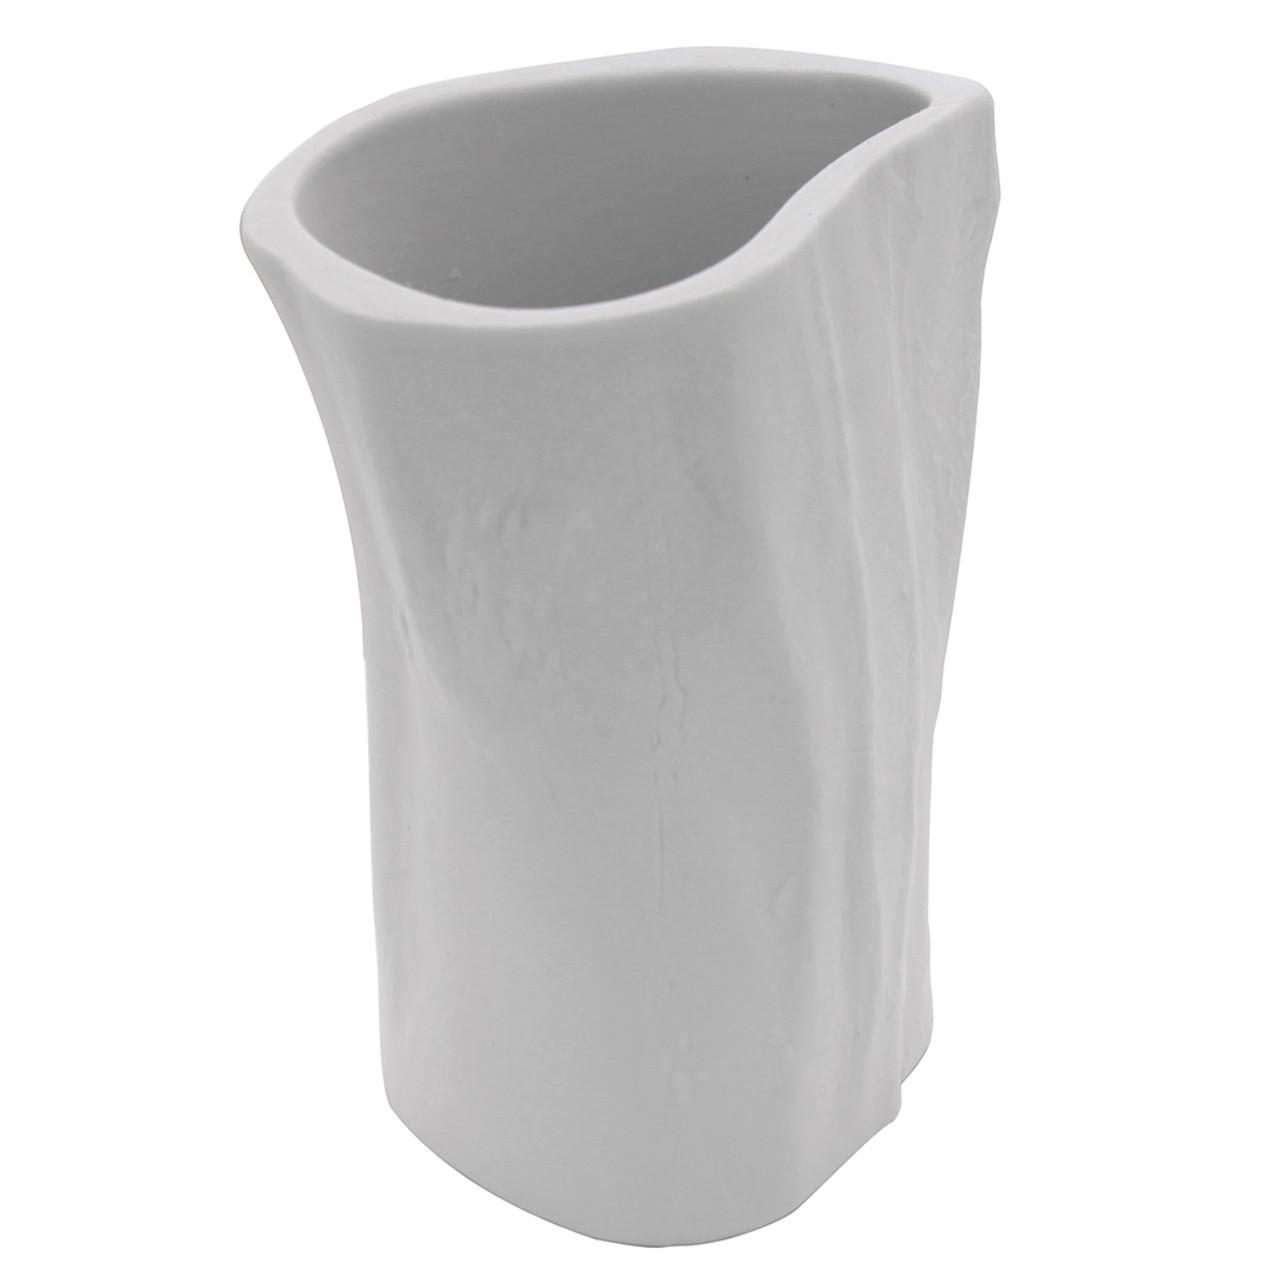 Porcelain Bone Marrow Jug